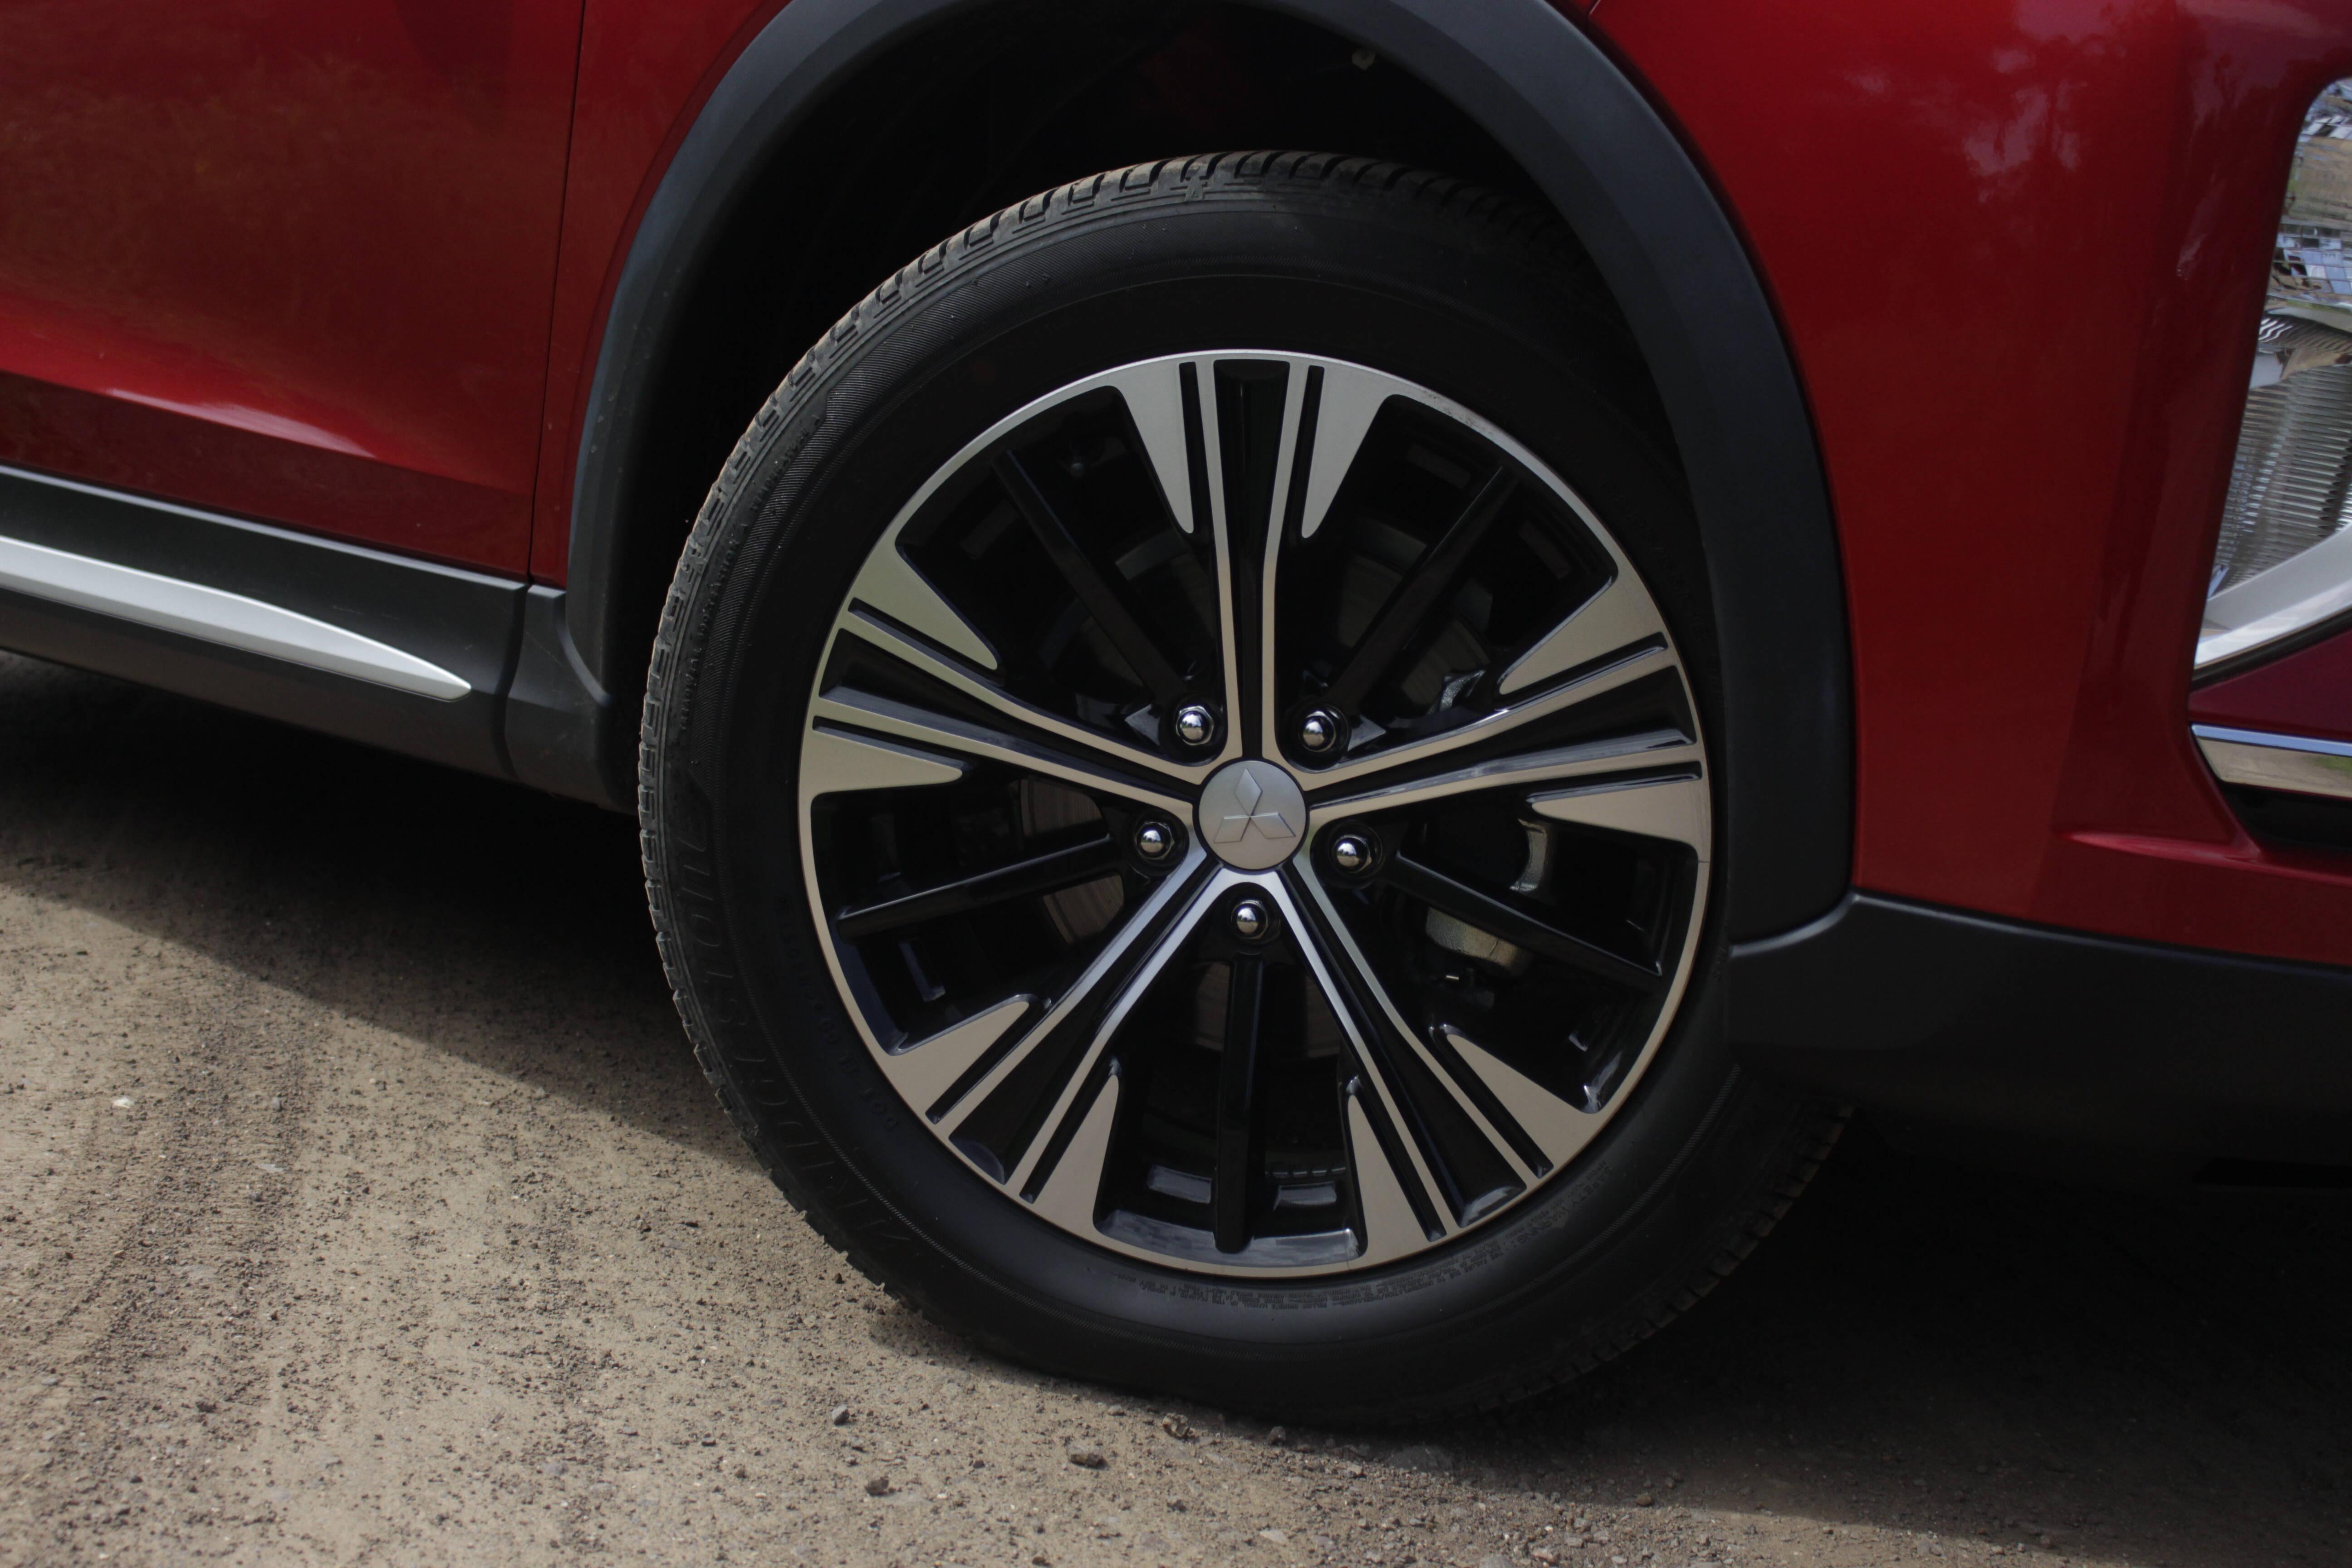 Mitsubishi Eclipse Cross 2019. Foto: Cauê Lira/iG Carros